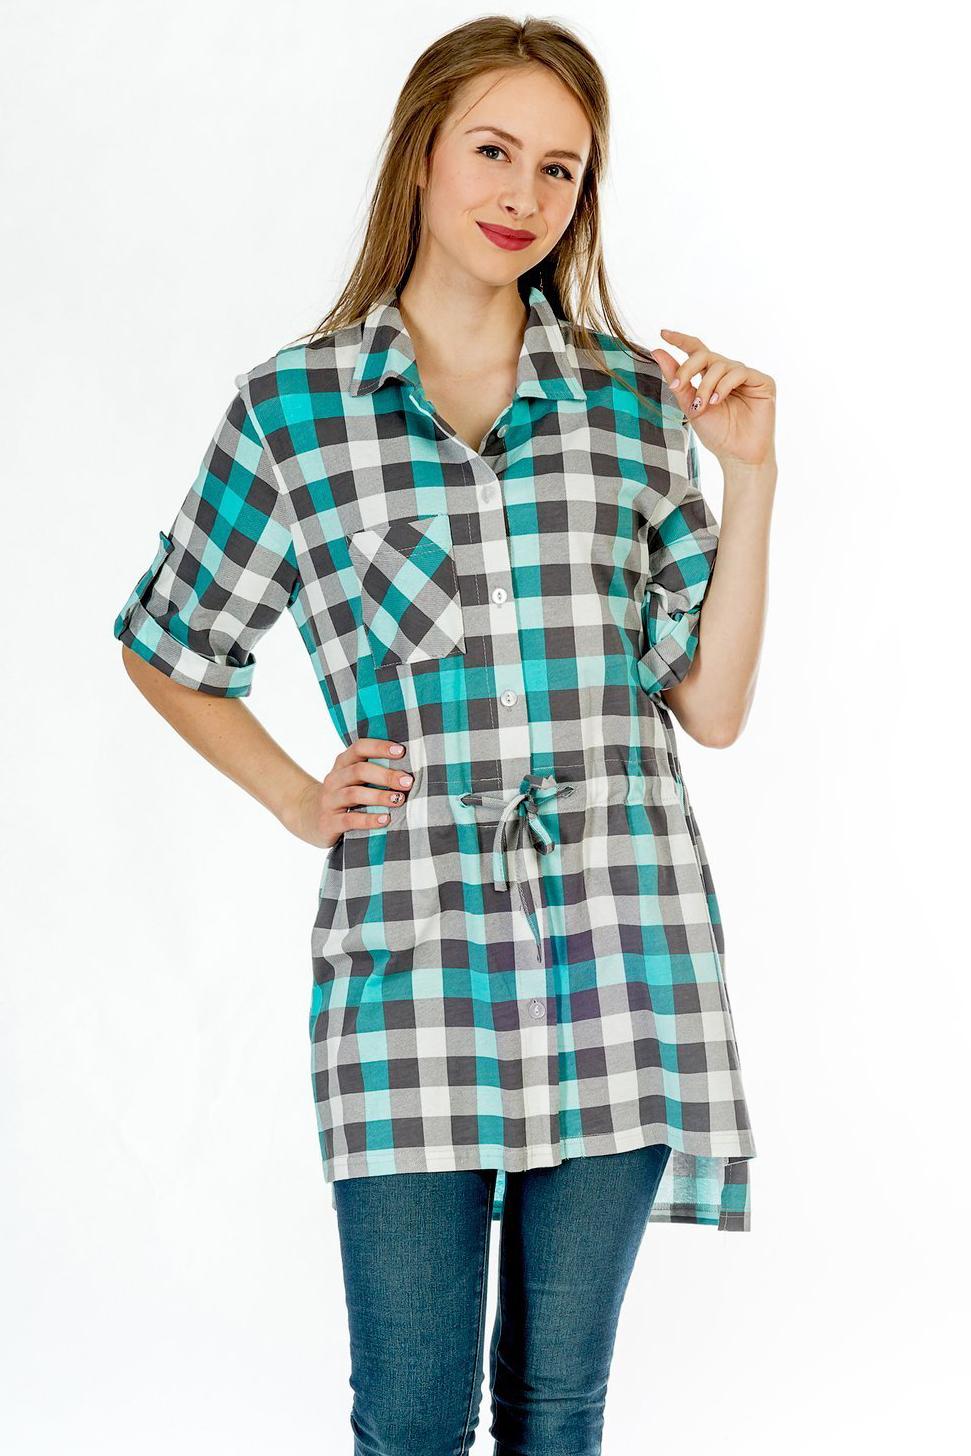 Туники, сарафаны Pastilla Туника-рубашка Бритни 2 Цвет: Ментол (xxxxL)